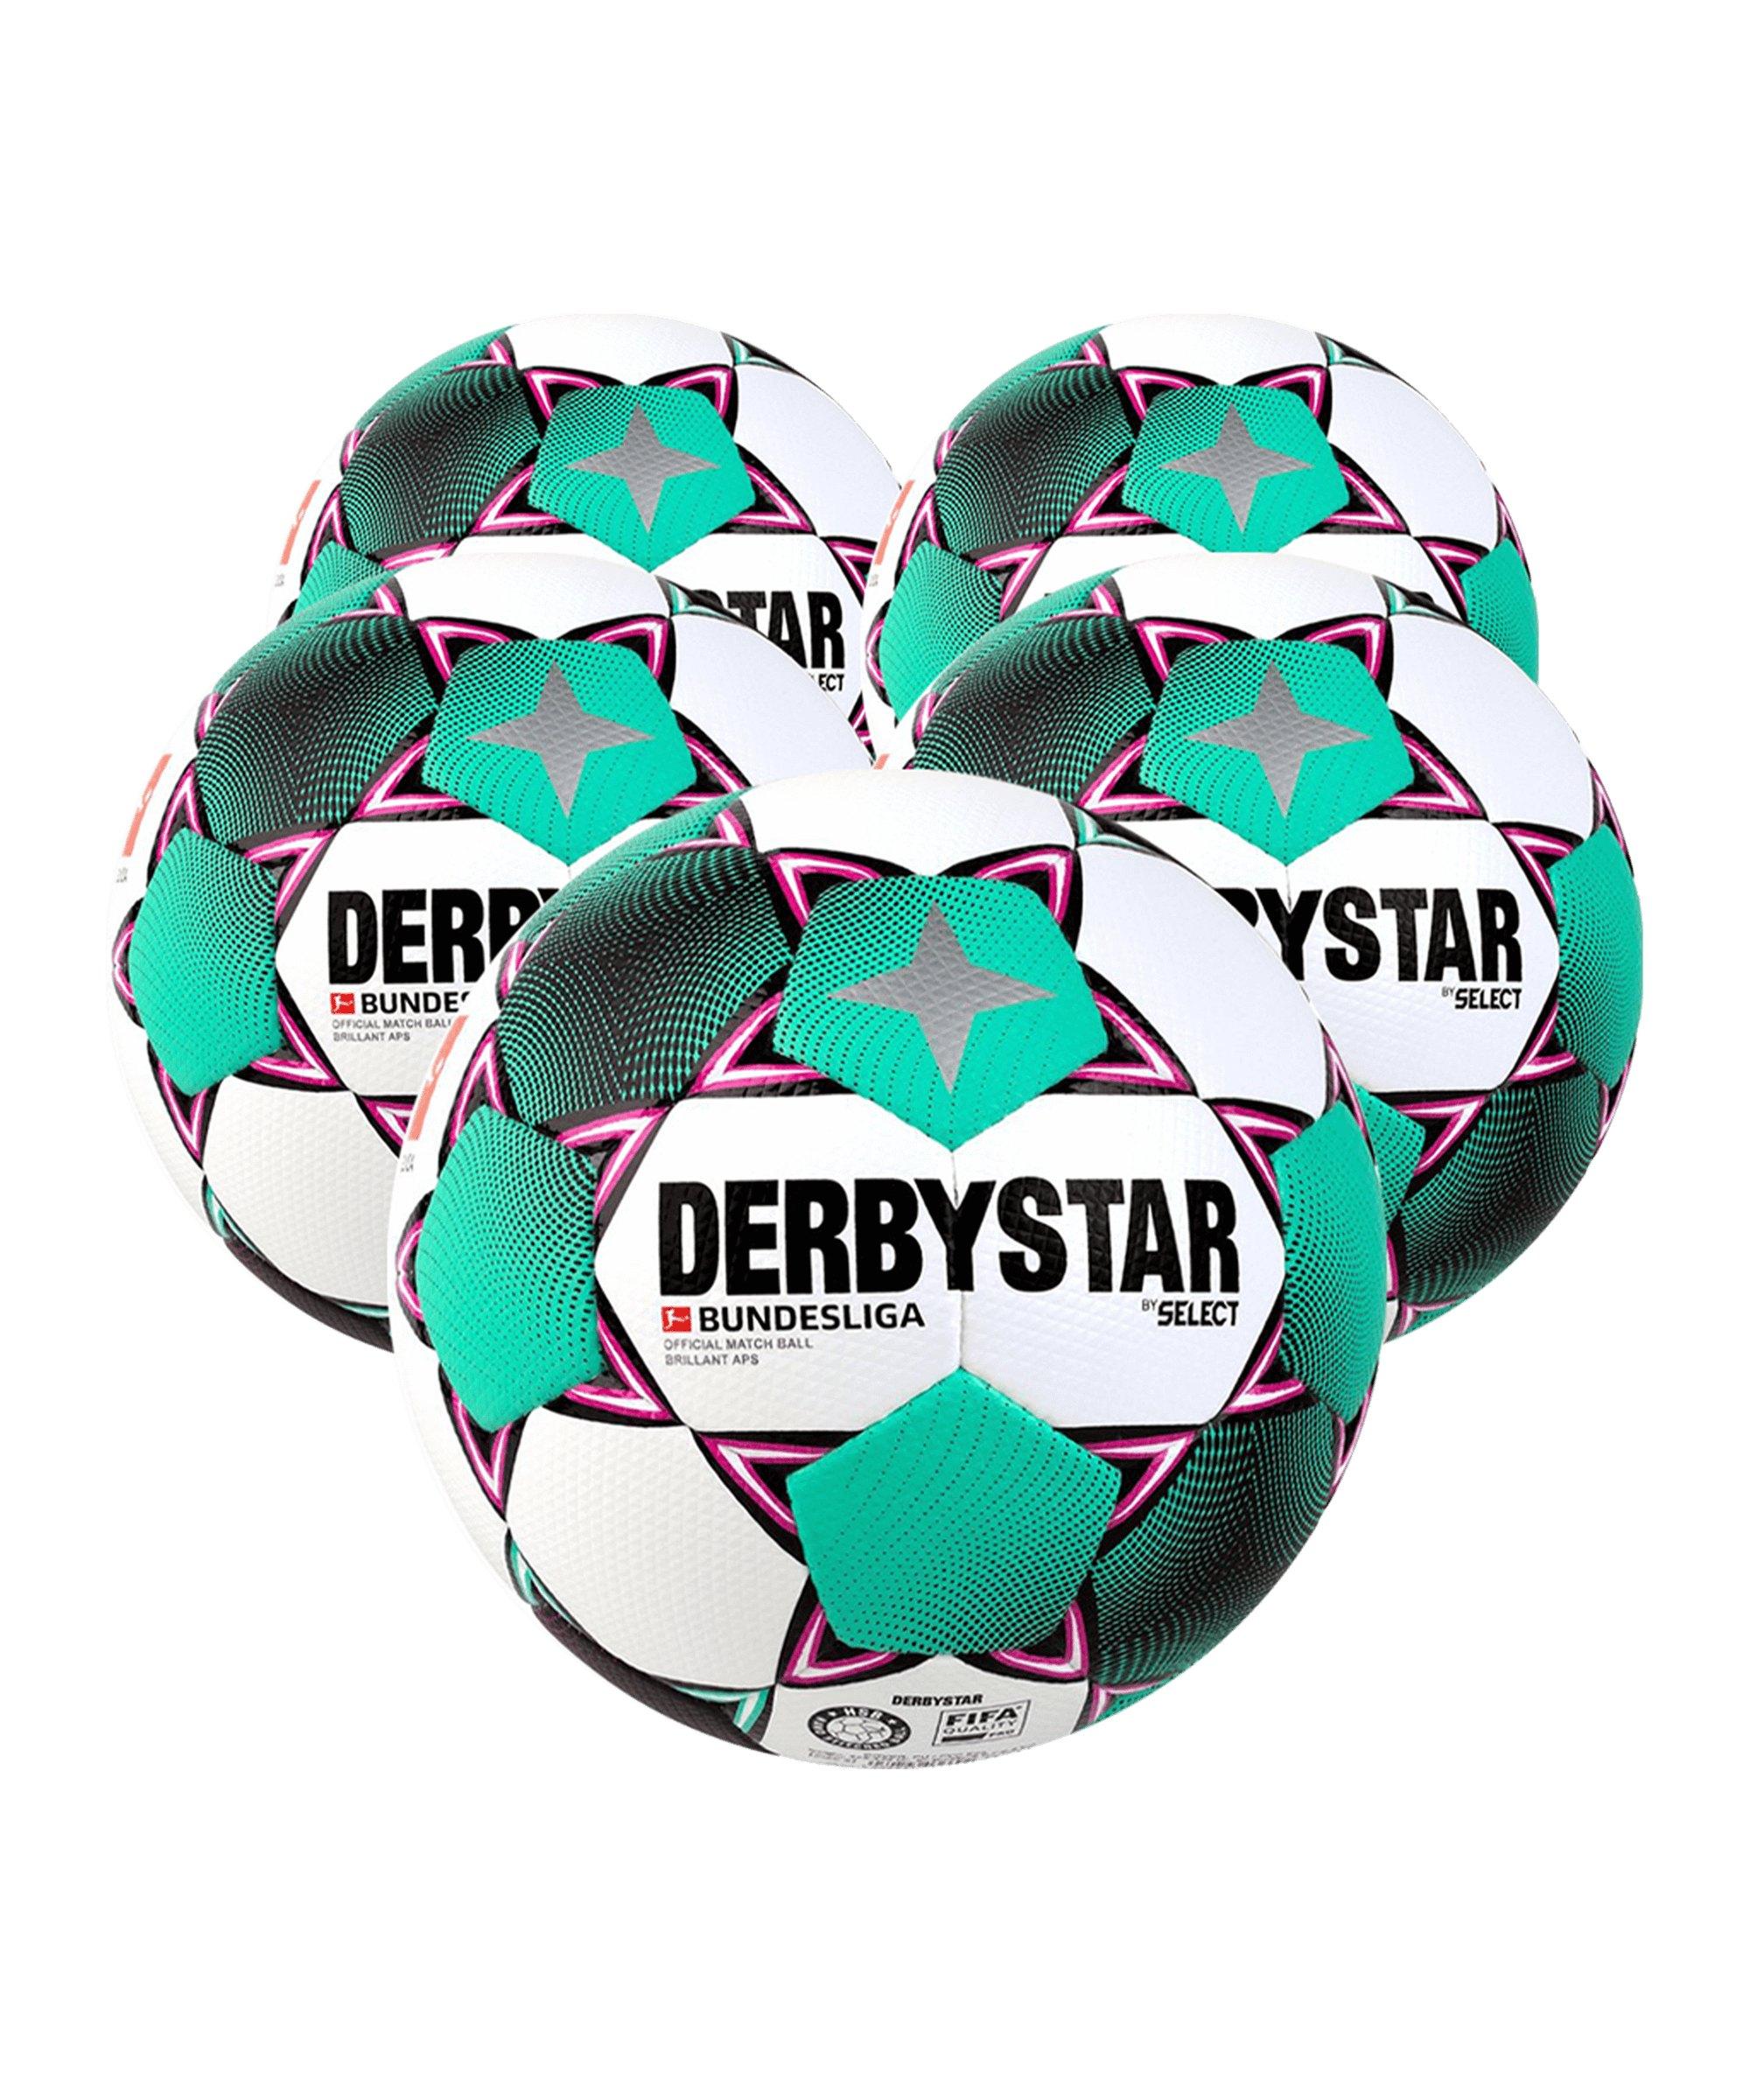 Derbystar Bundesliga Brillant APS x5 Spielball Weiss F020 - weiss